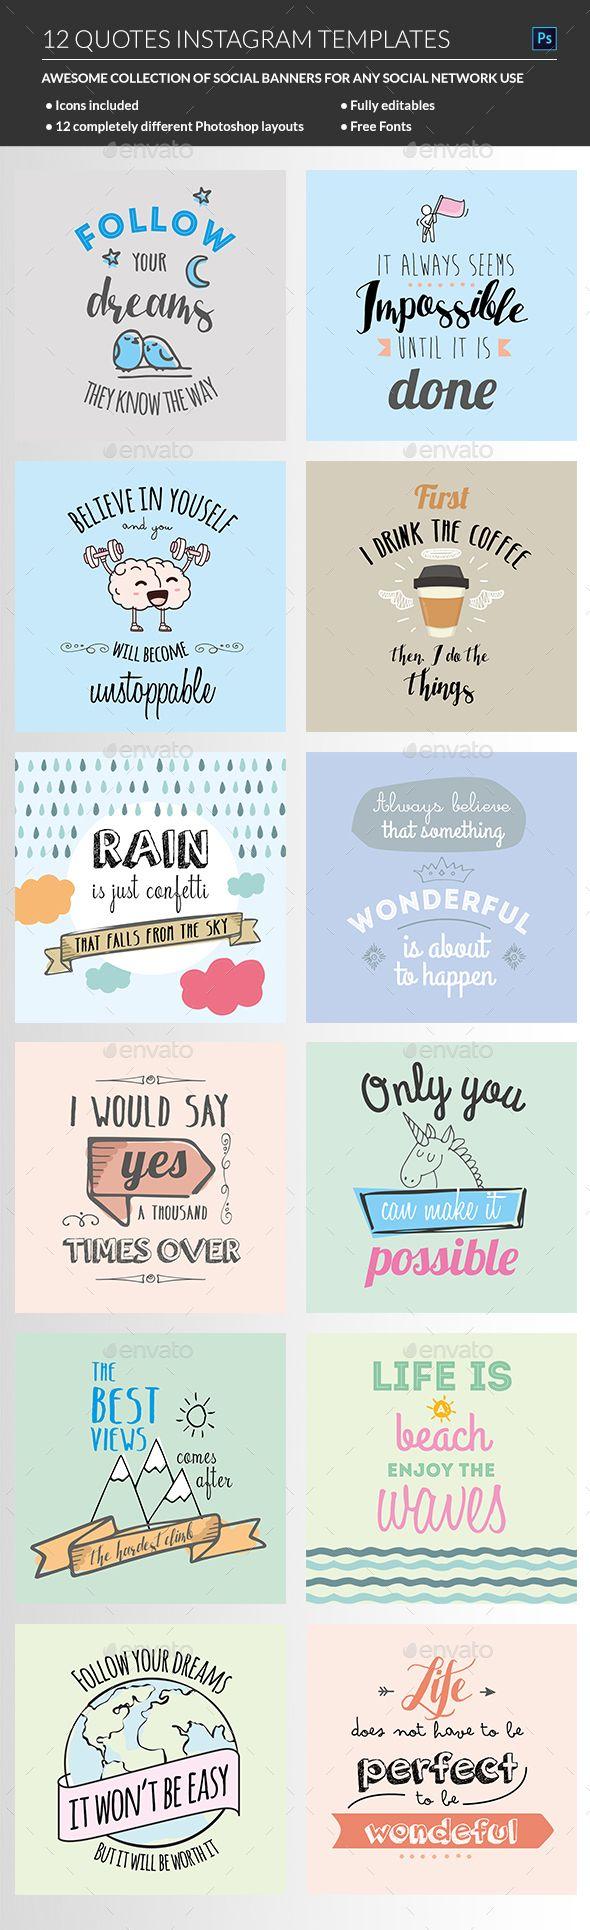 quotes templates